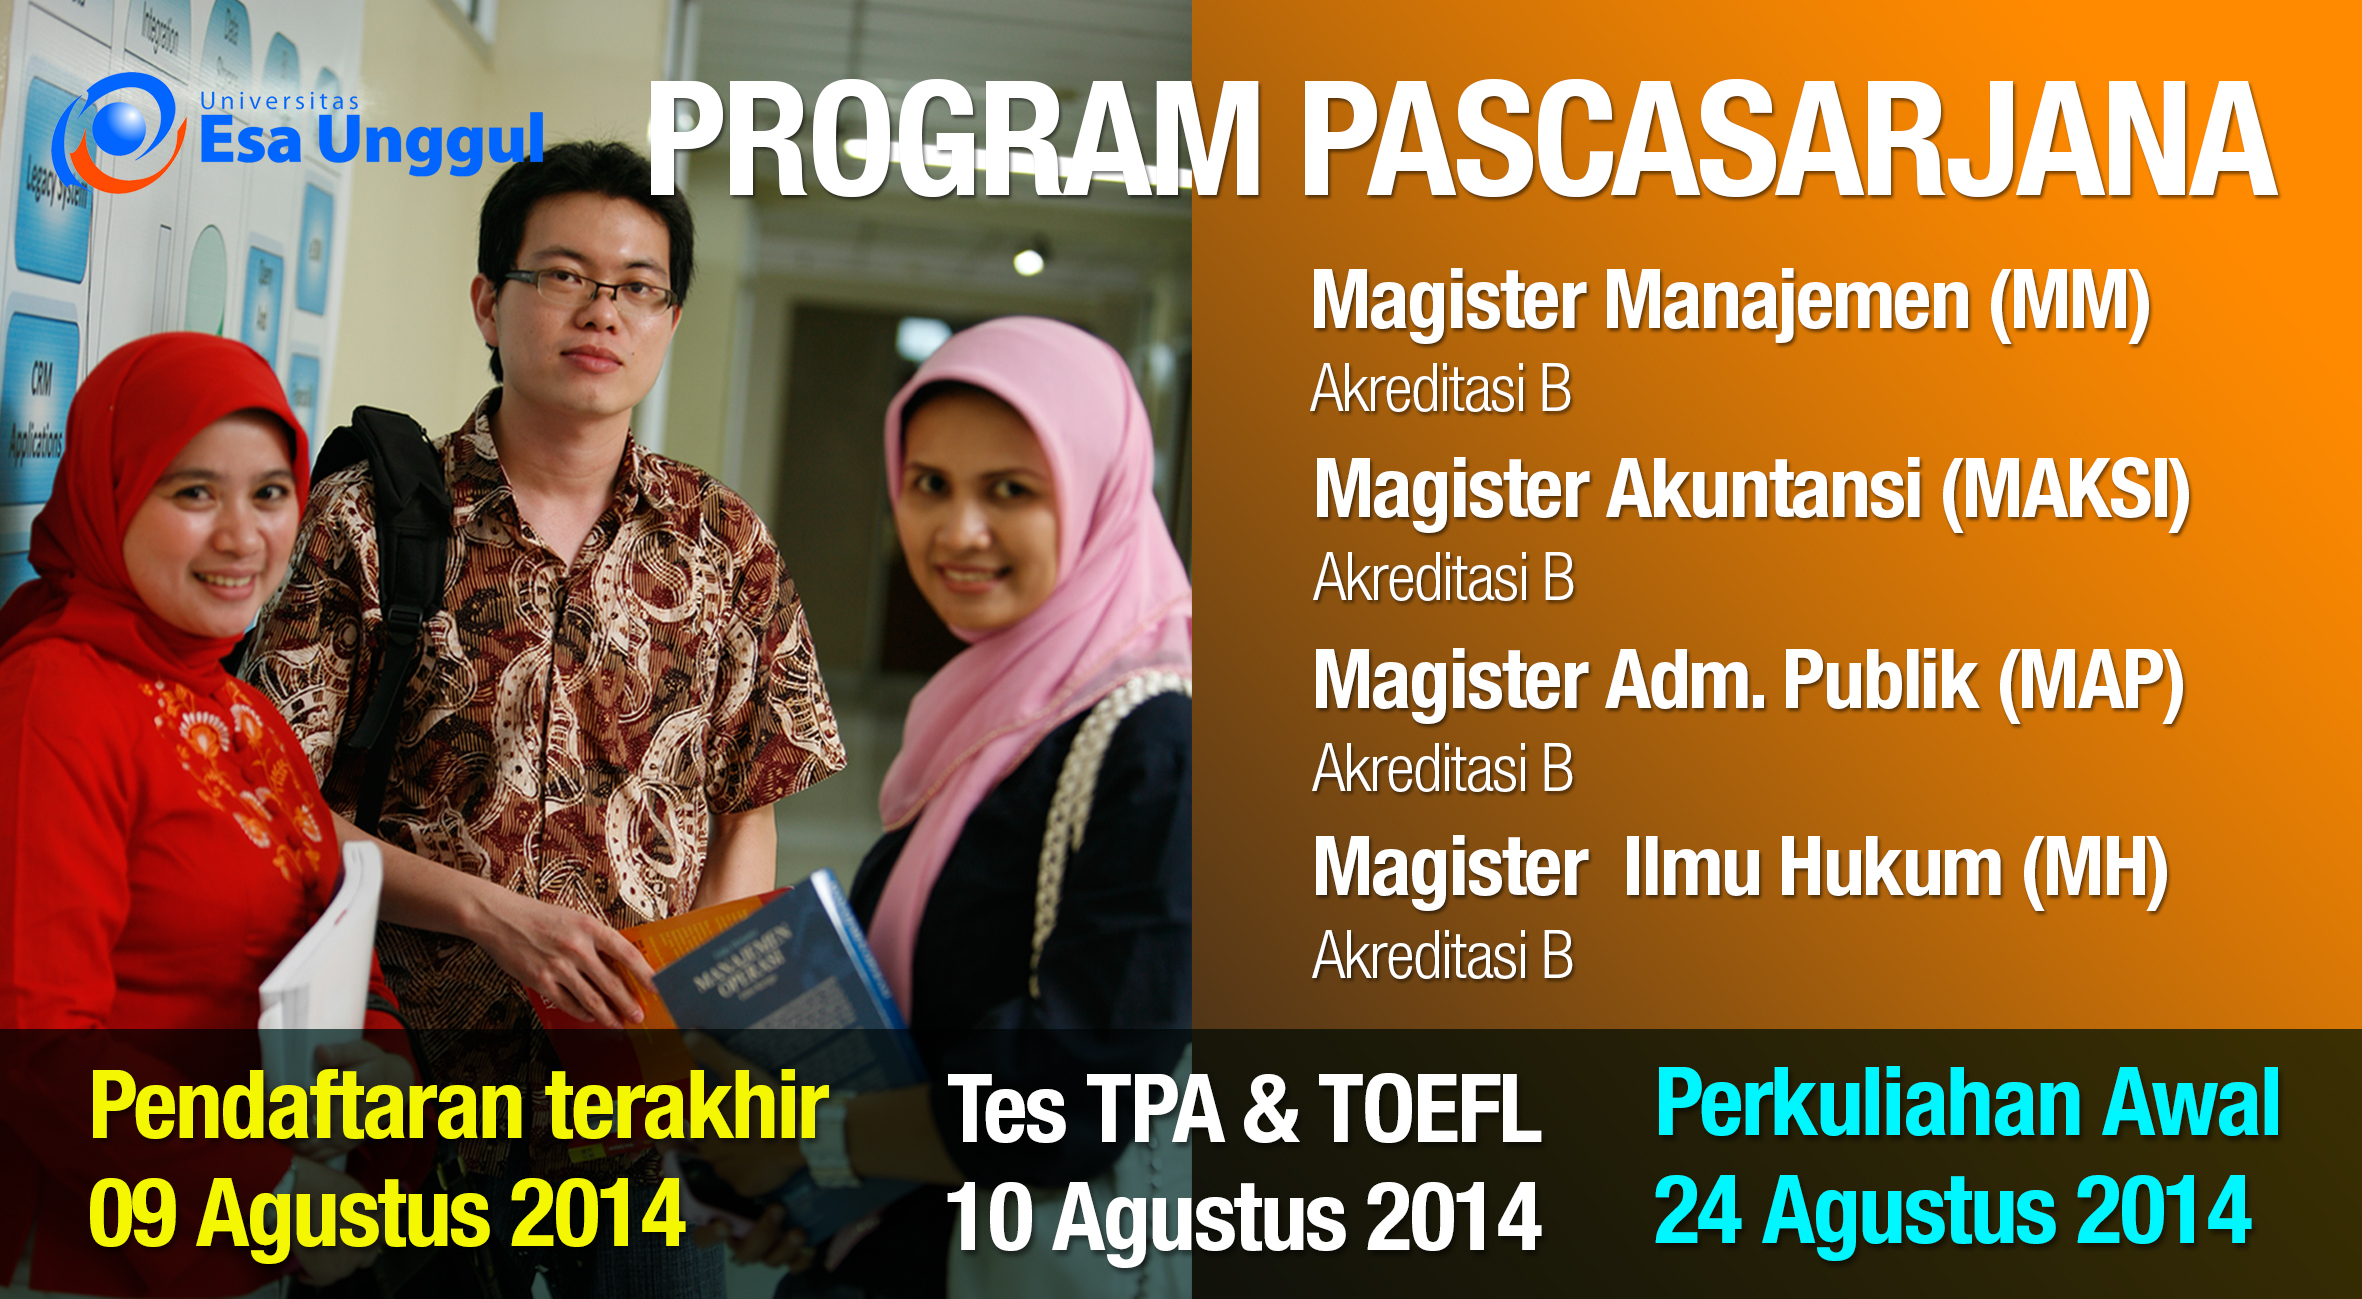 Pendaftaran Mahasiswa Baru Program Pascasarjana Tahun 2014